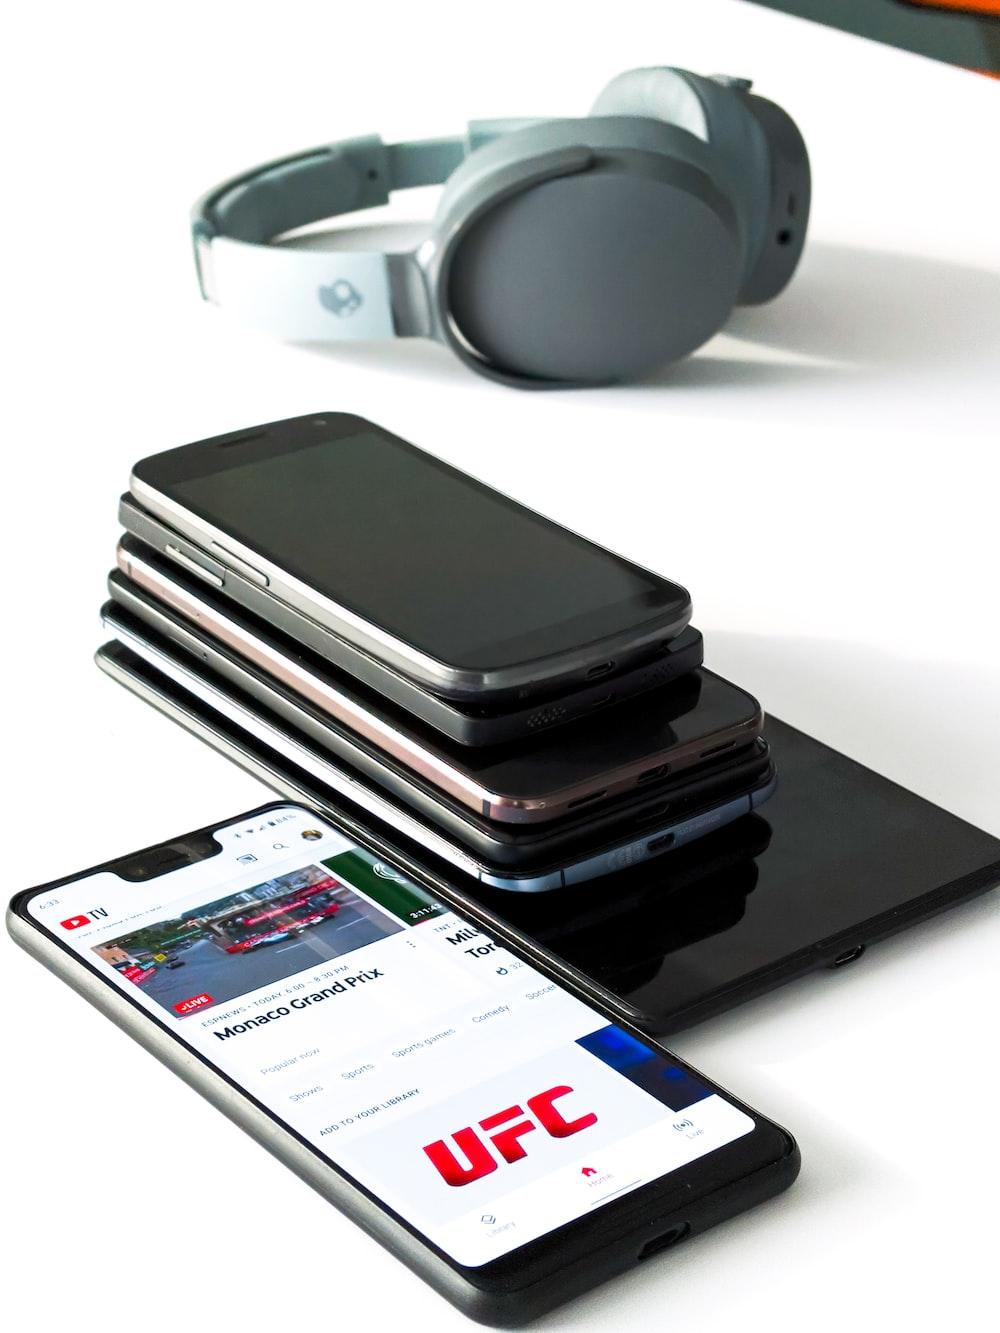 piled phones